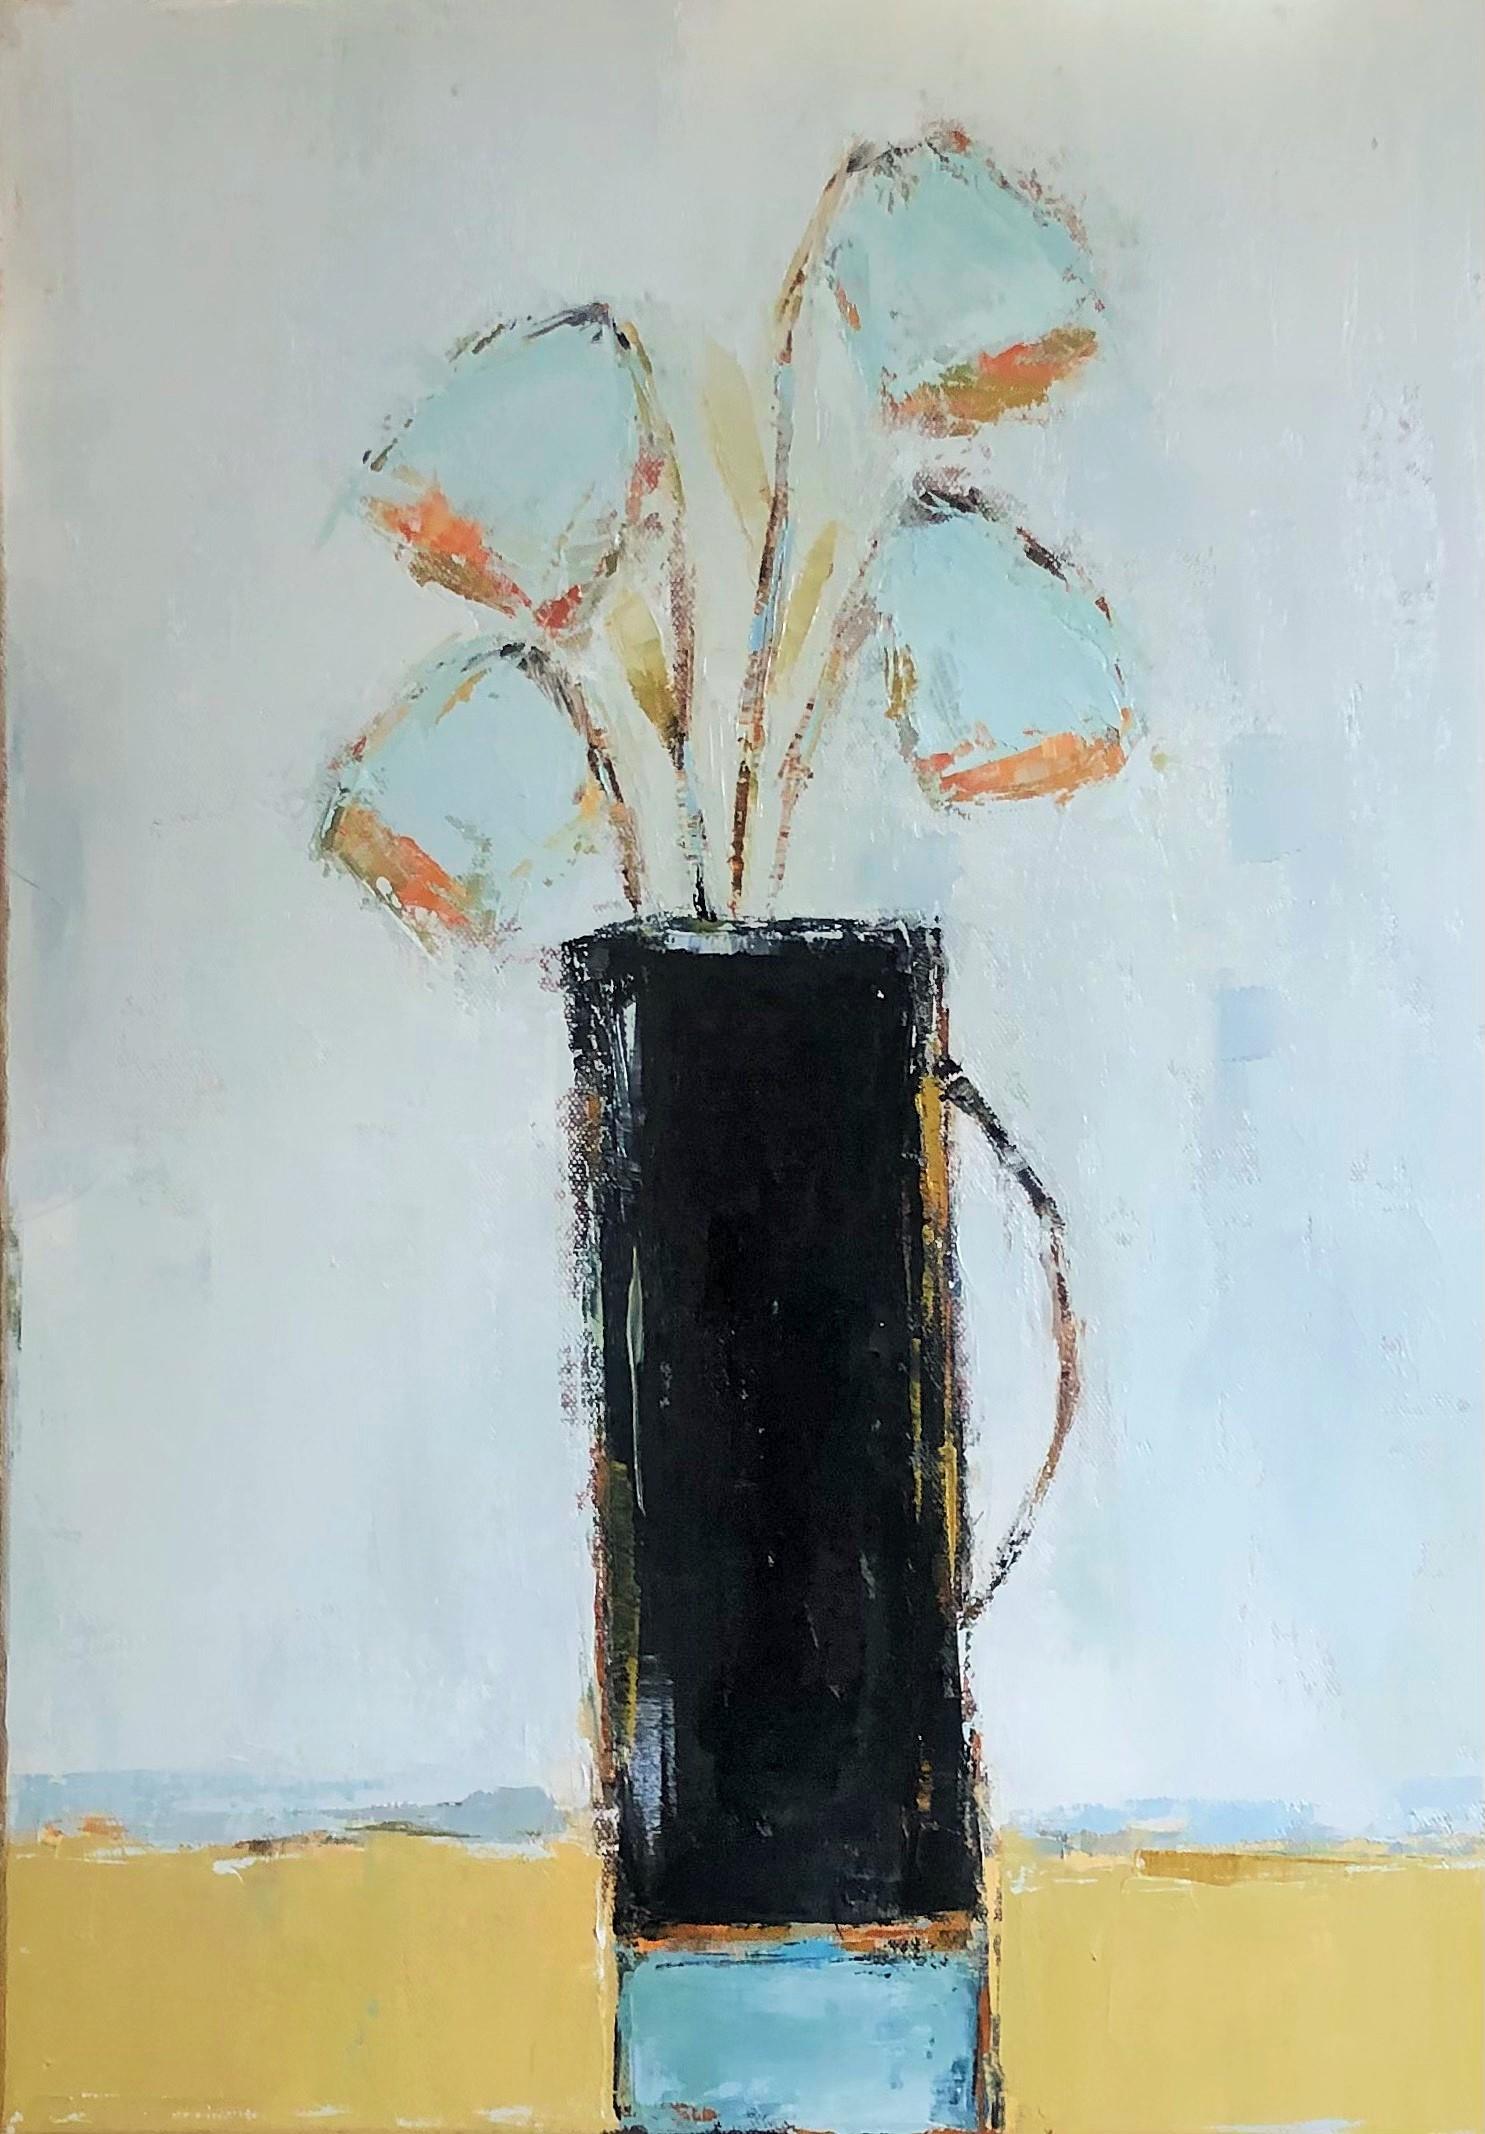 Black Vase by Geri Eubanks, Petite Floral Impressionist Oil Painting